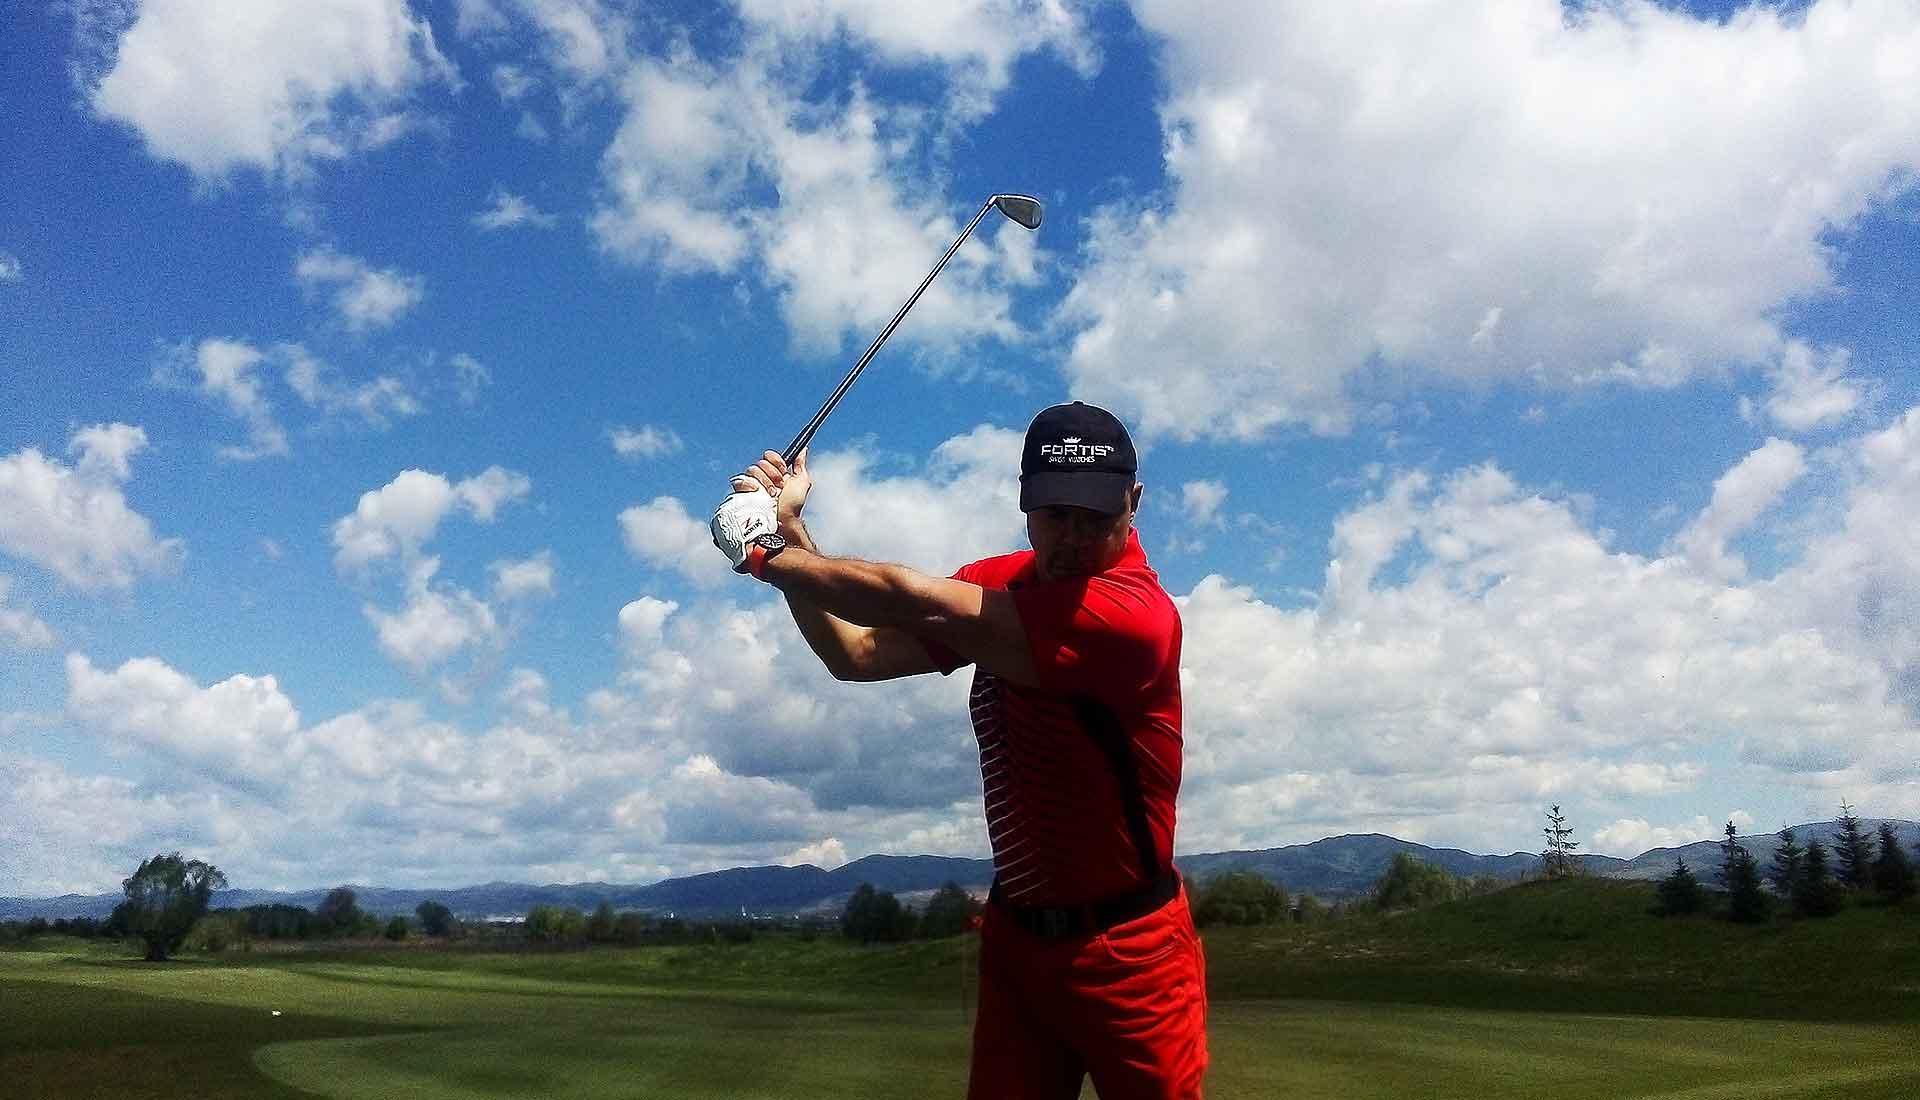 Дигитално обучение в и близо до голф игрището